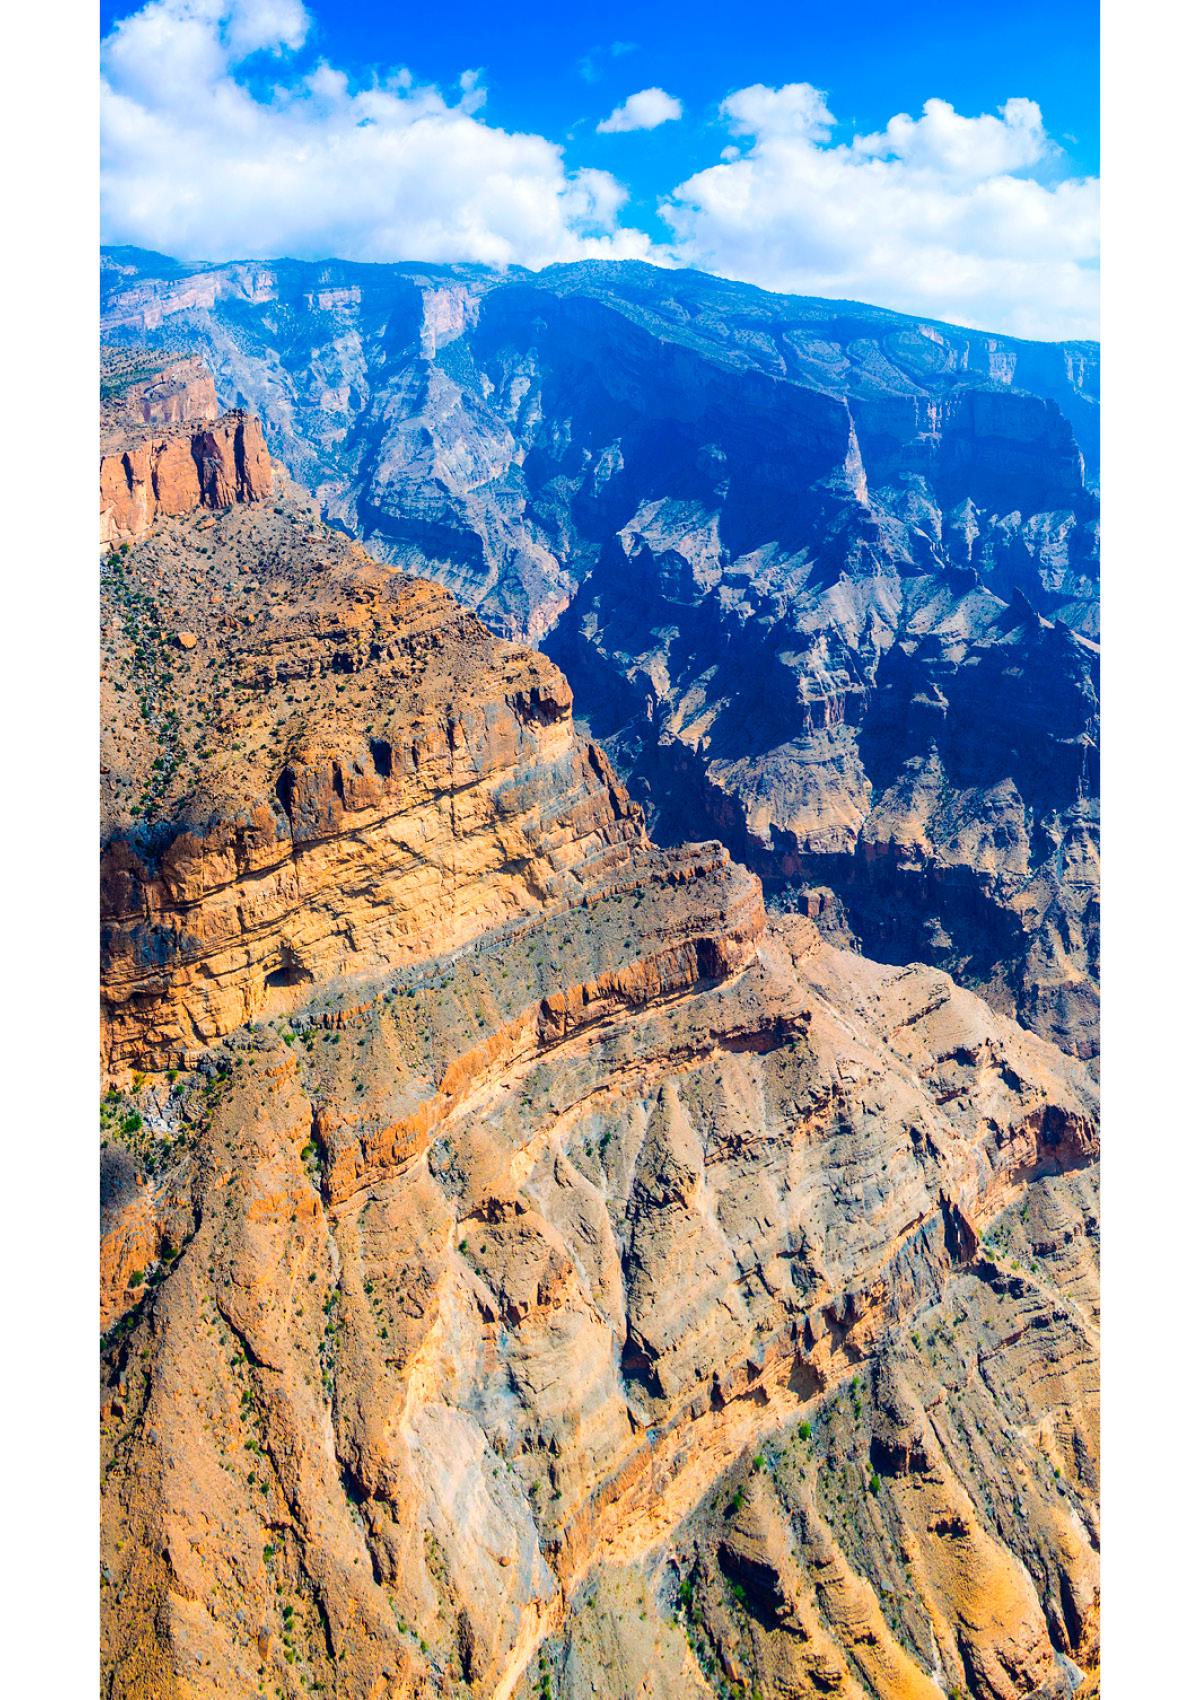 Dekor Canyon (Flat E)